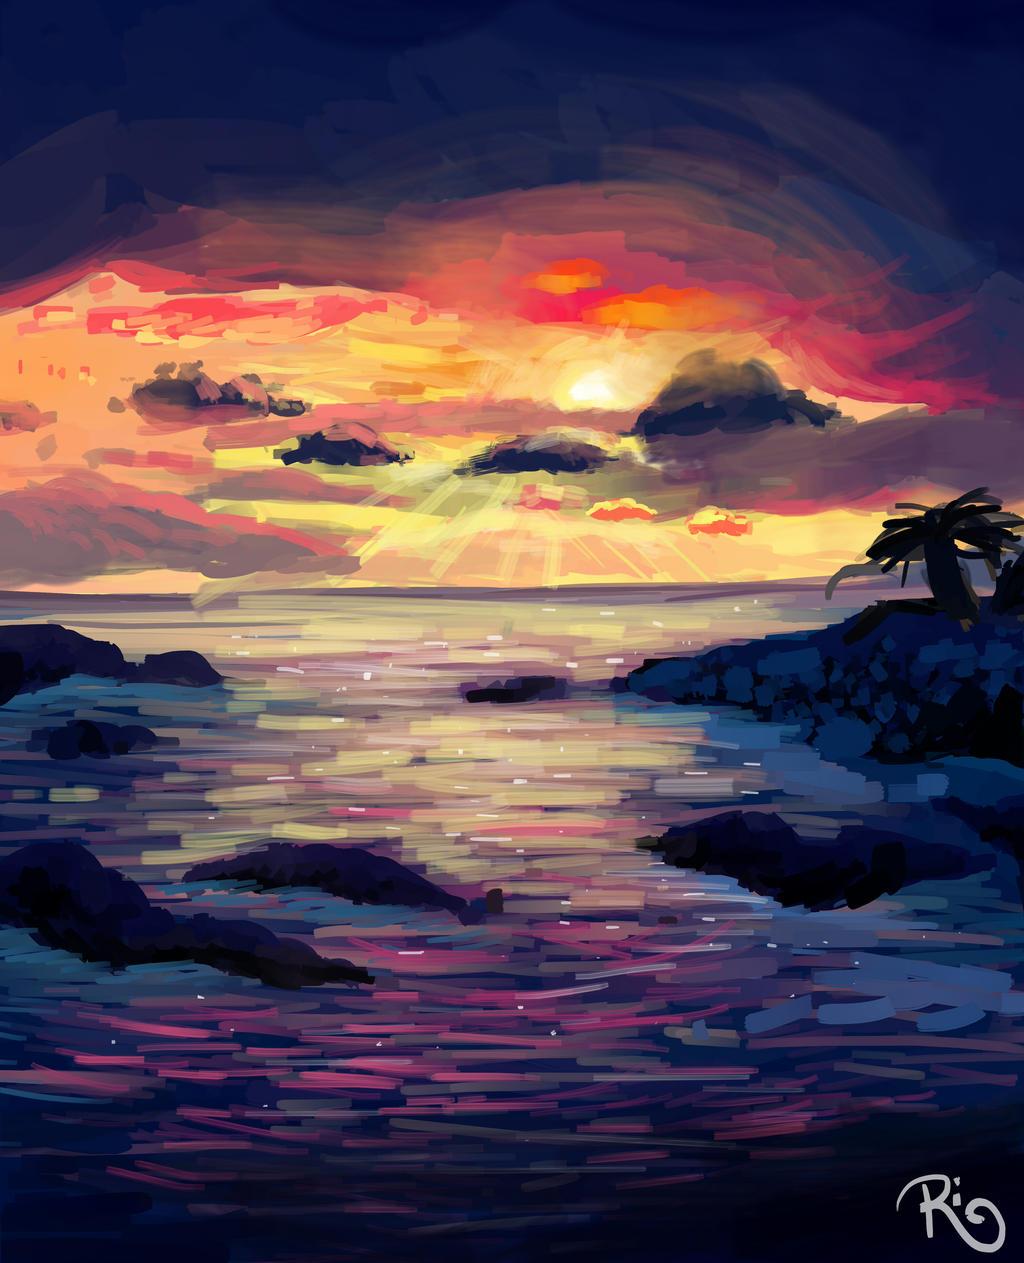 Hawaiian sunset by Riquis101